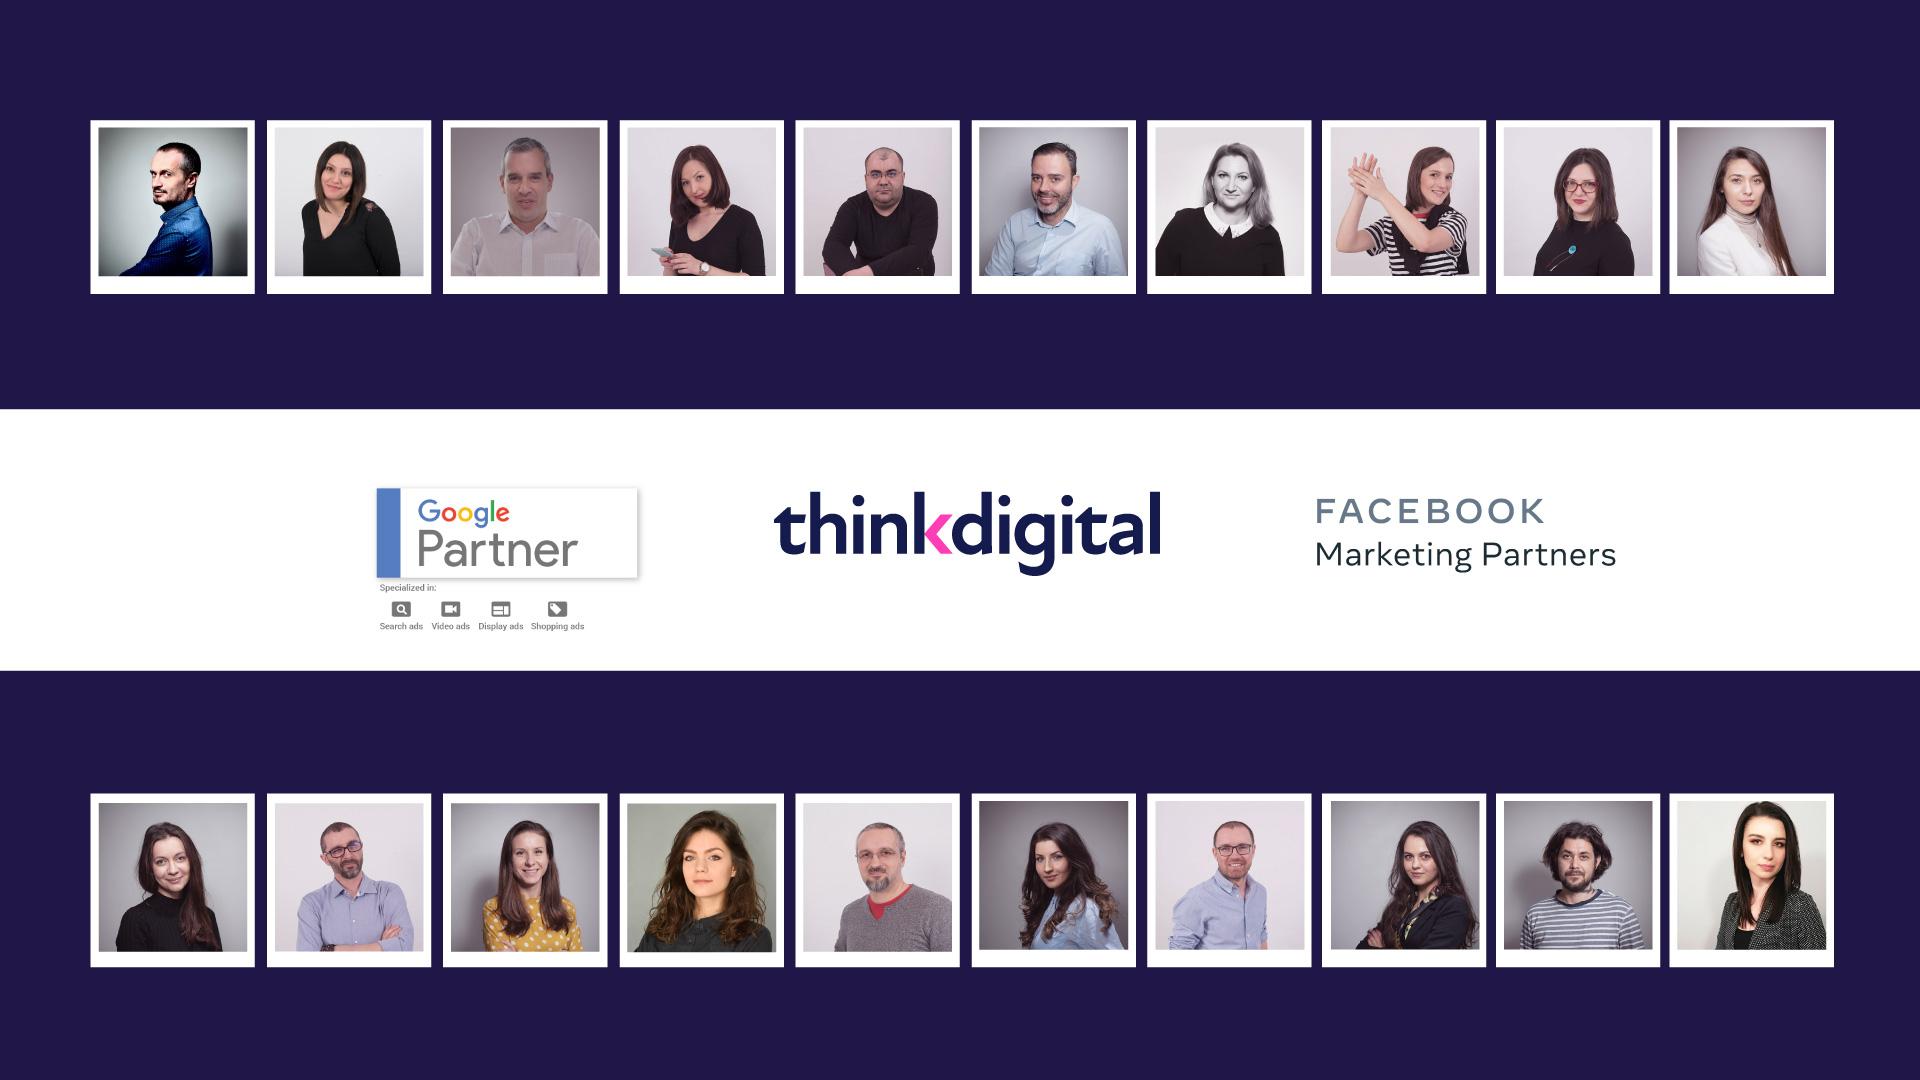 Thinkdigital is now Google Partner and Facebook Marketing Partner. What's next?